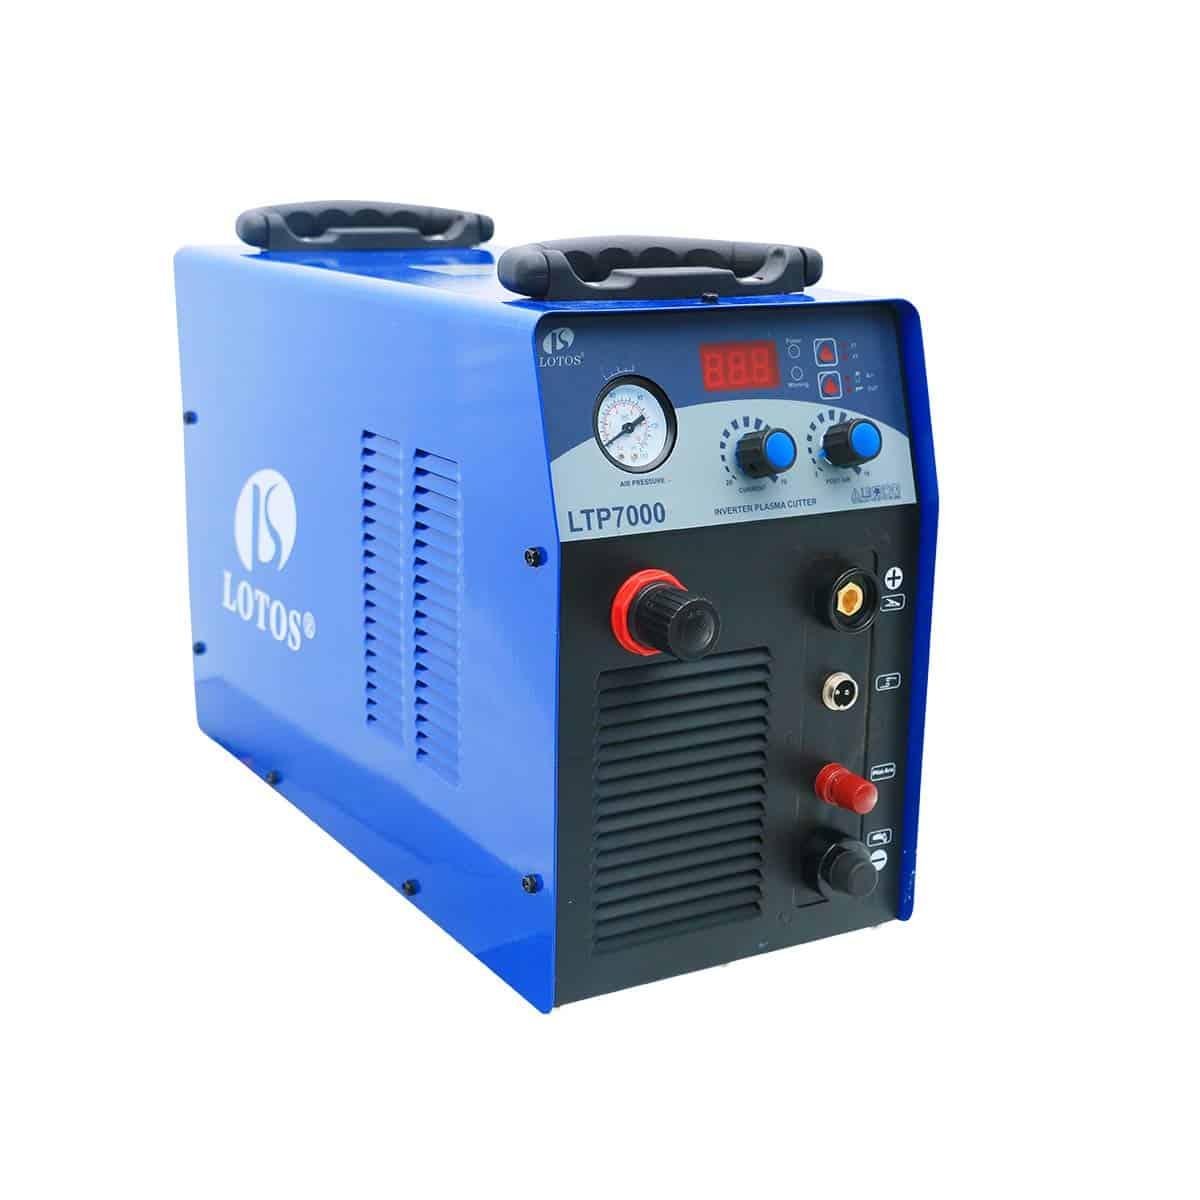 LOTOS LTP7000 IGBT 70 Amps